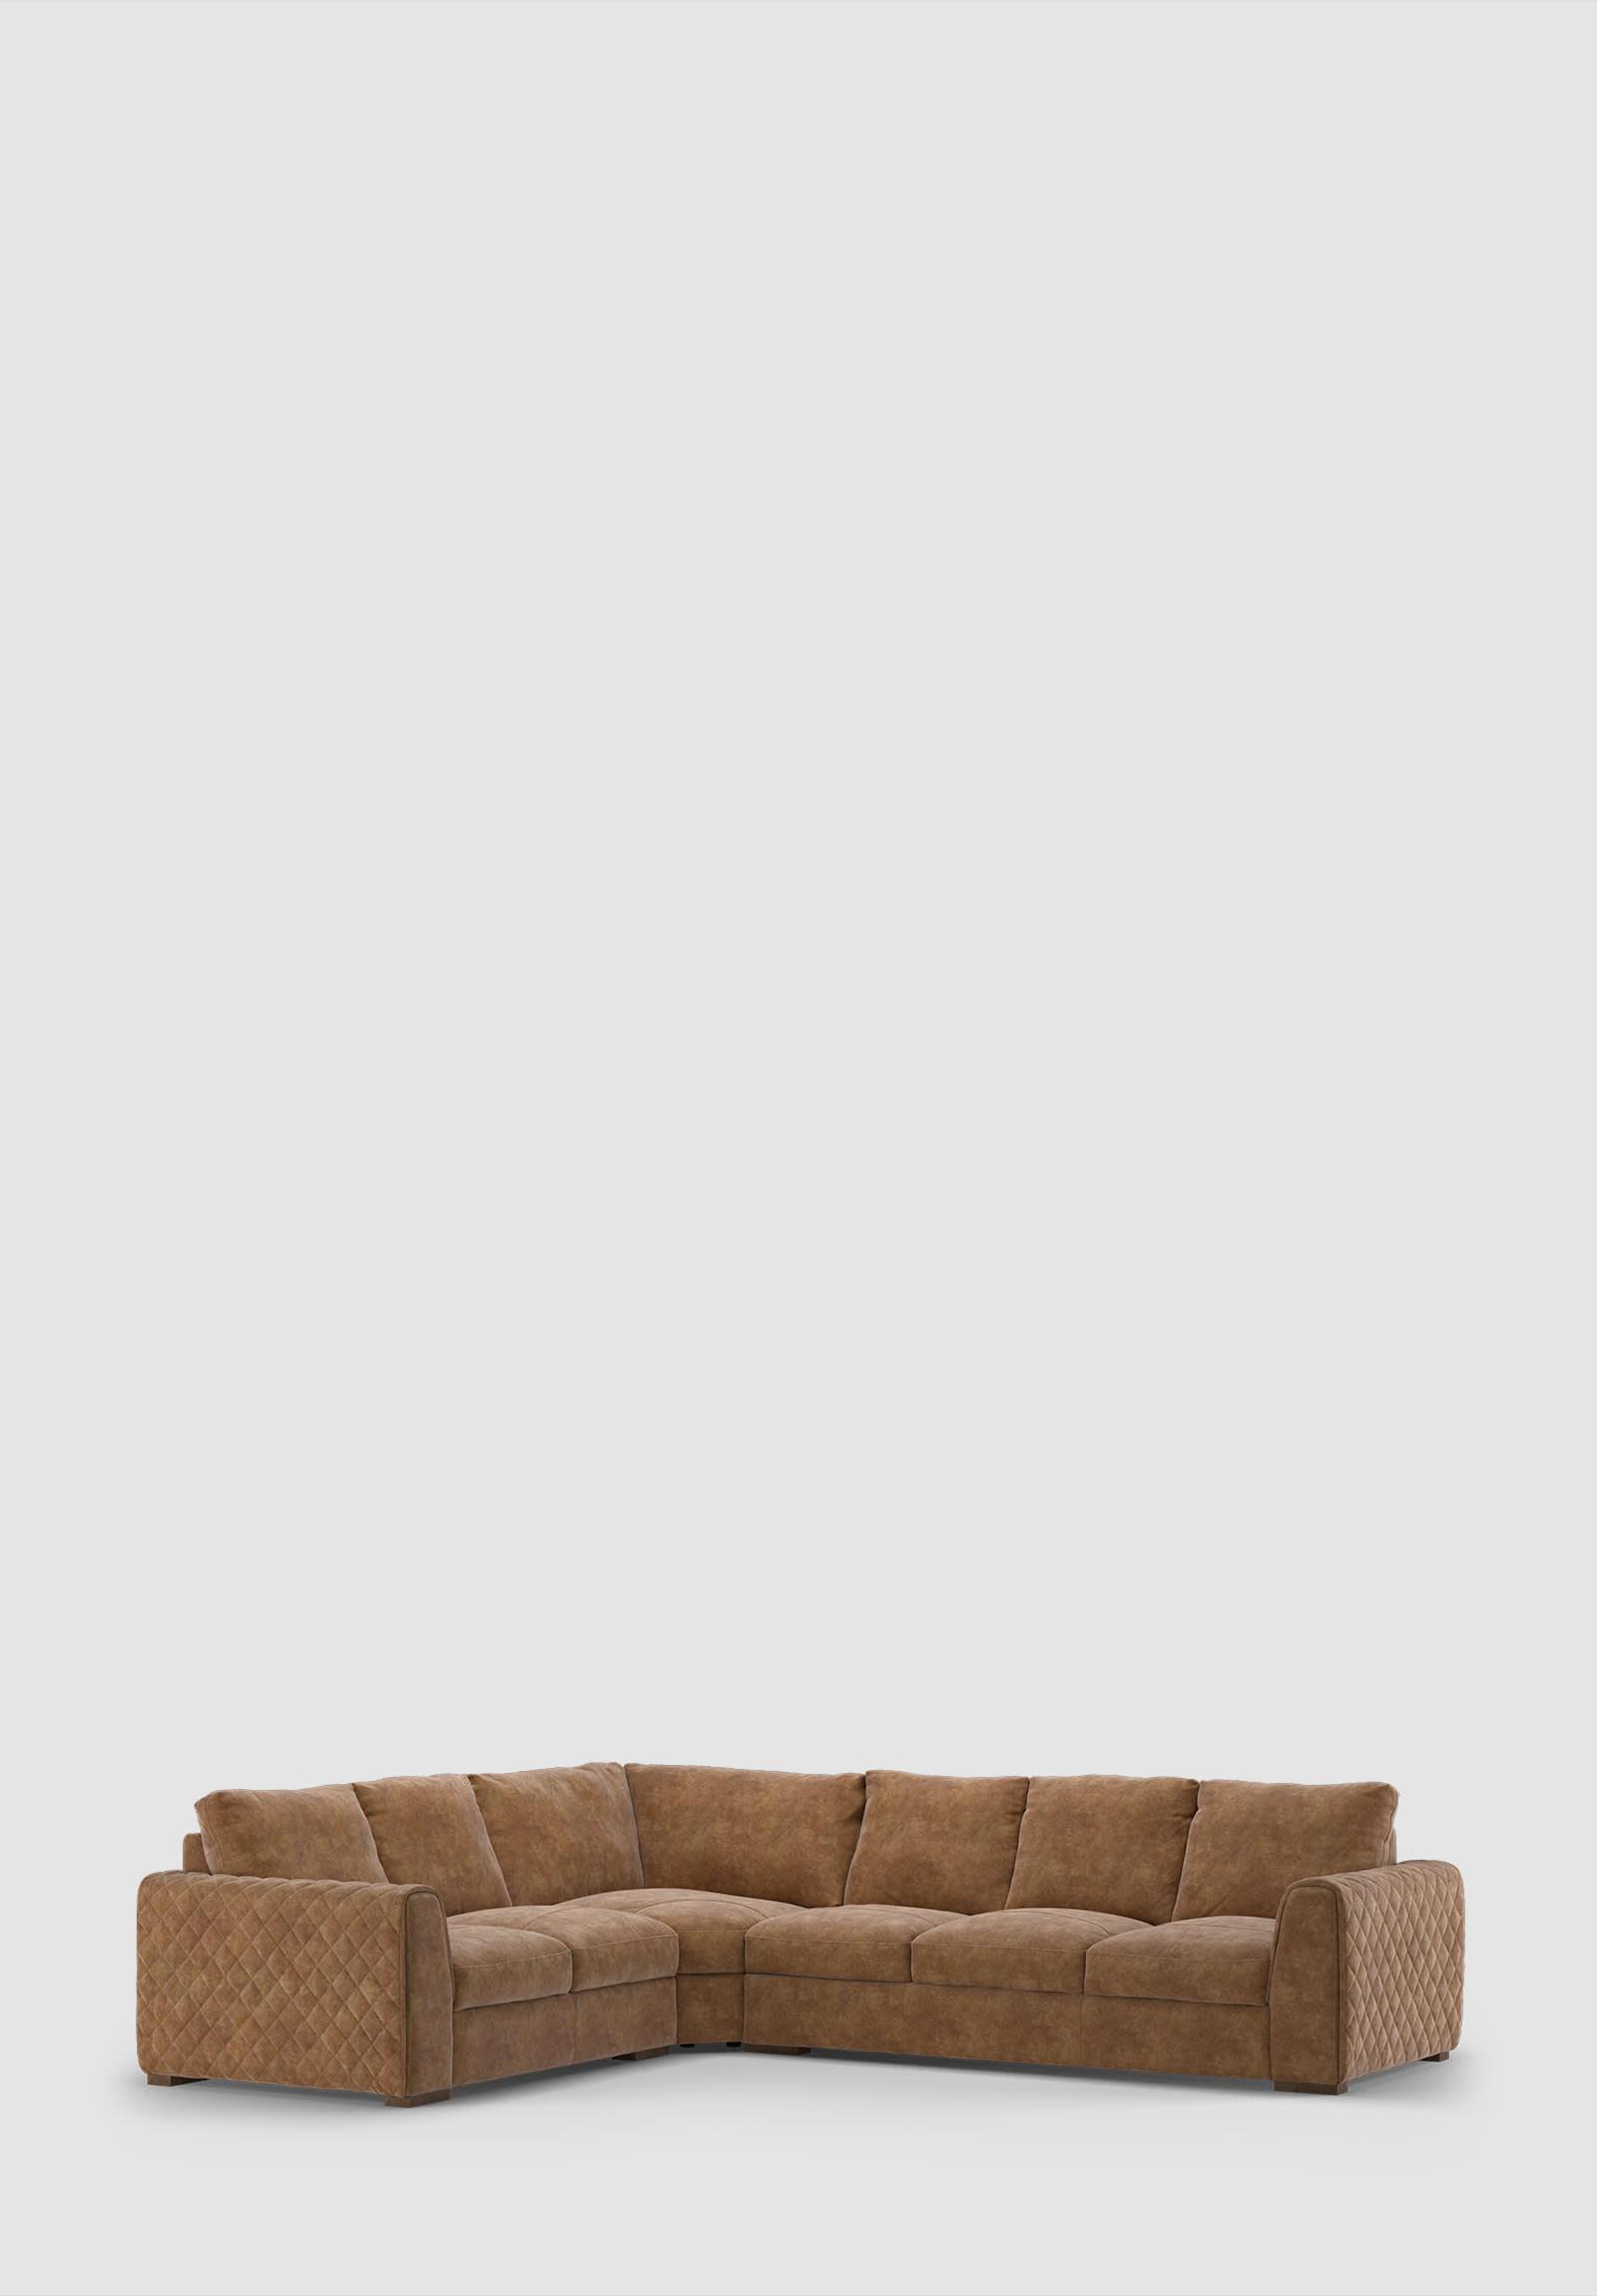 Sofology Mazzini tan leather corner sofa